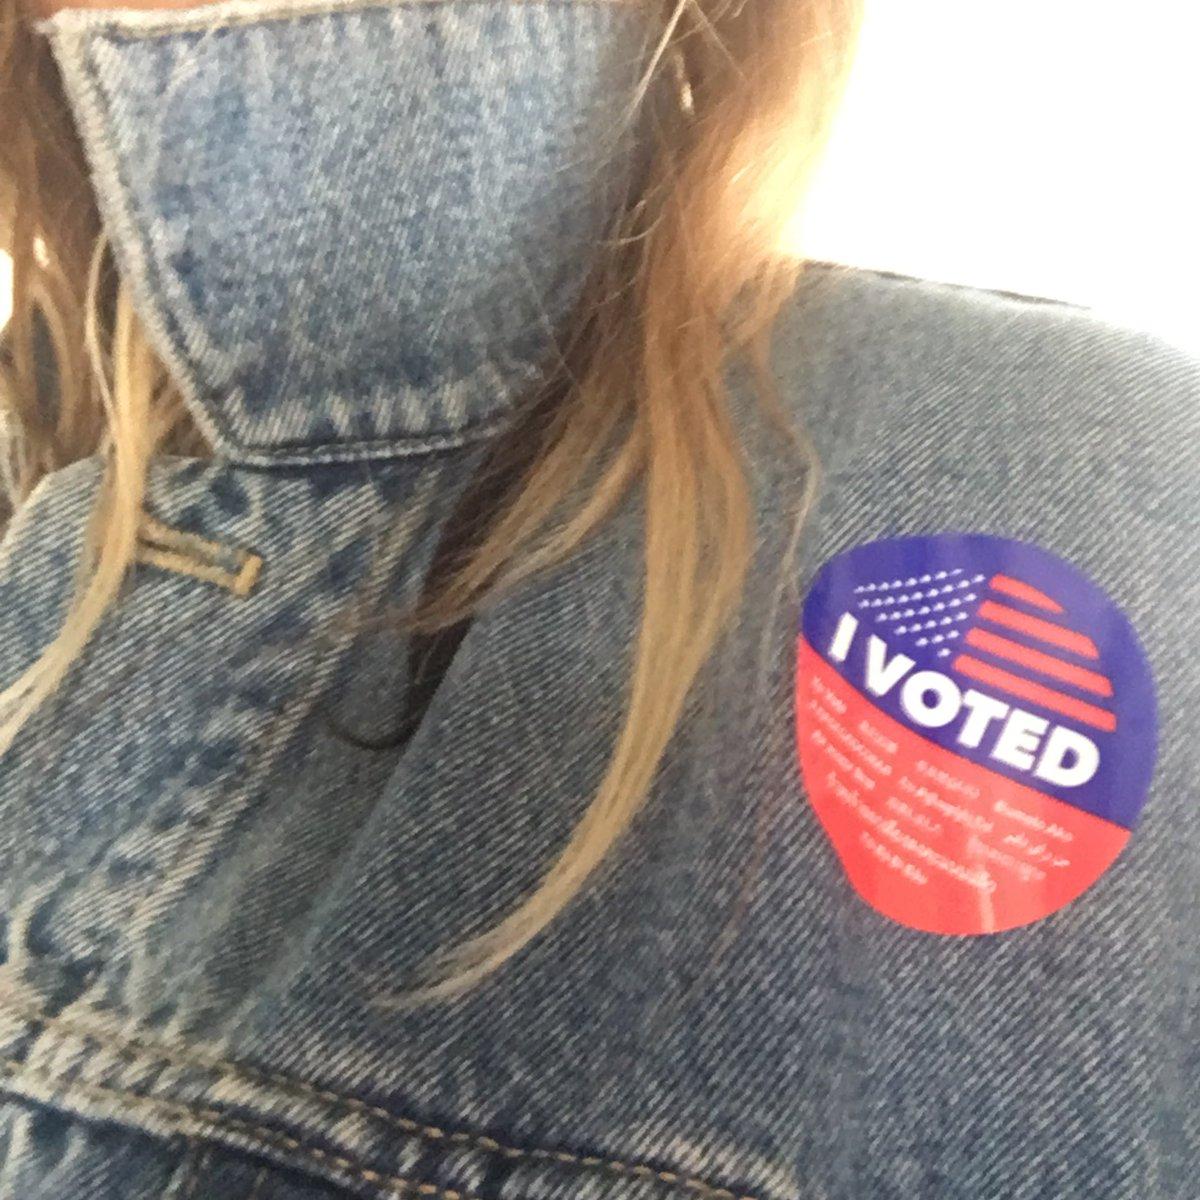 #VoteTuesday ???????? https://t.co/vjvoGA3wwX